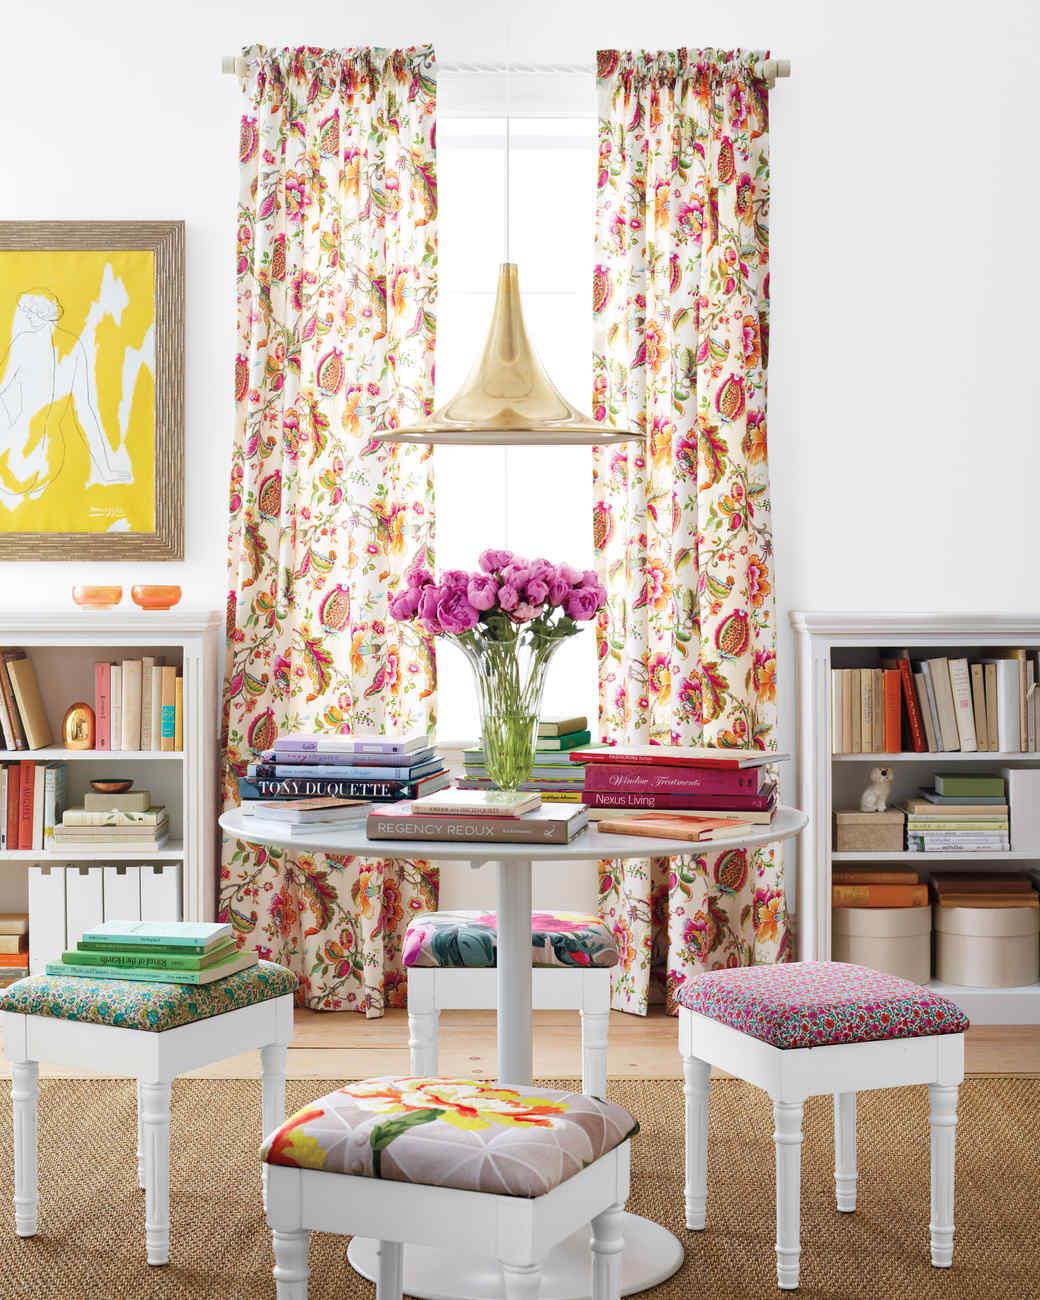 flower-mural-room3a19-0511mld1071093.jpg